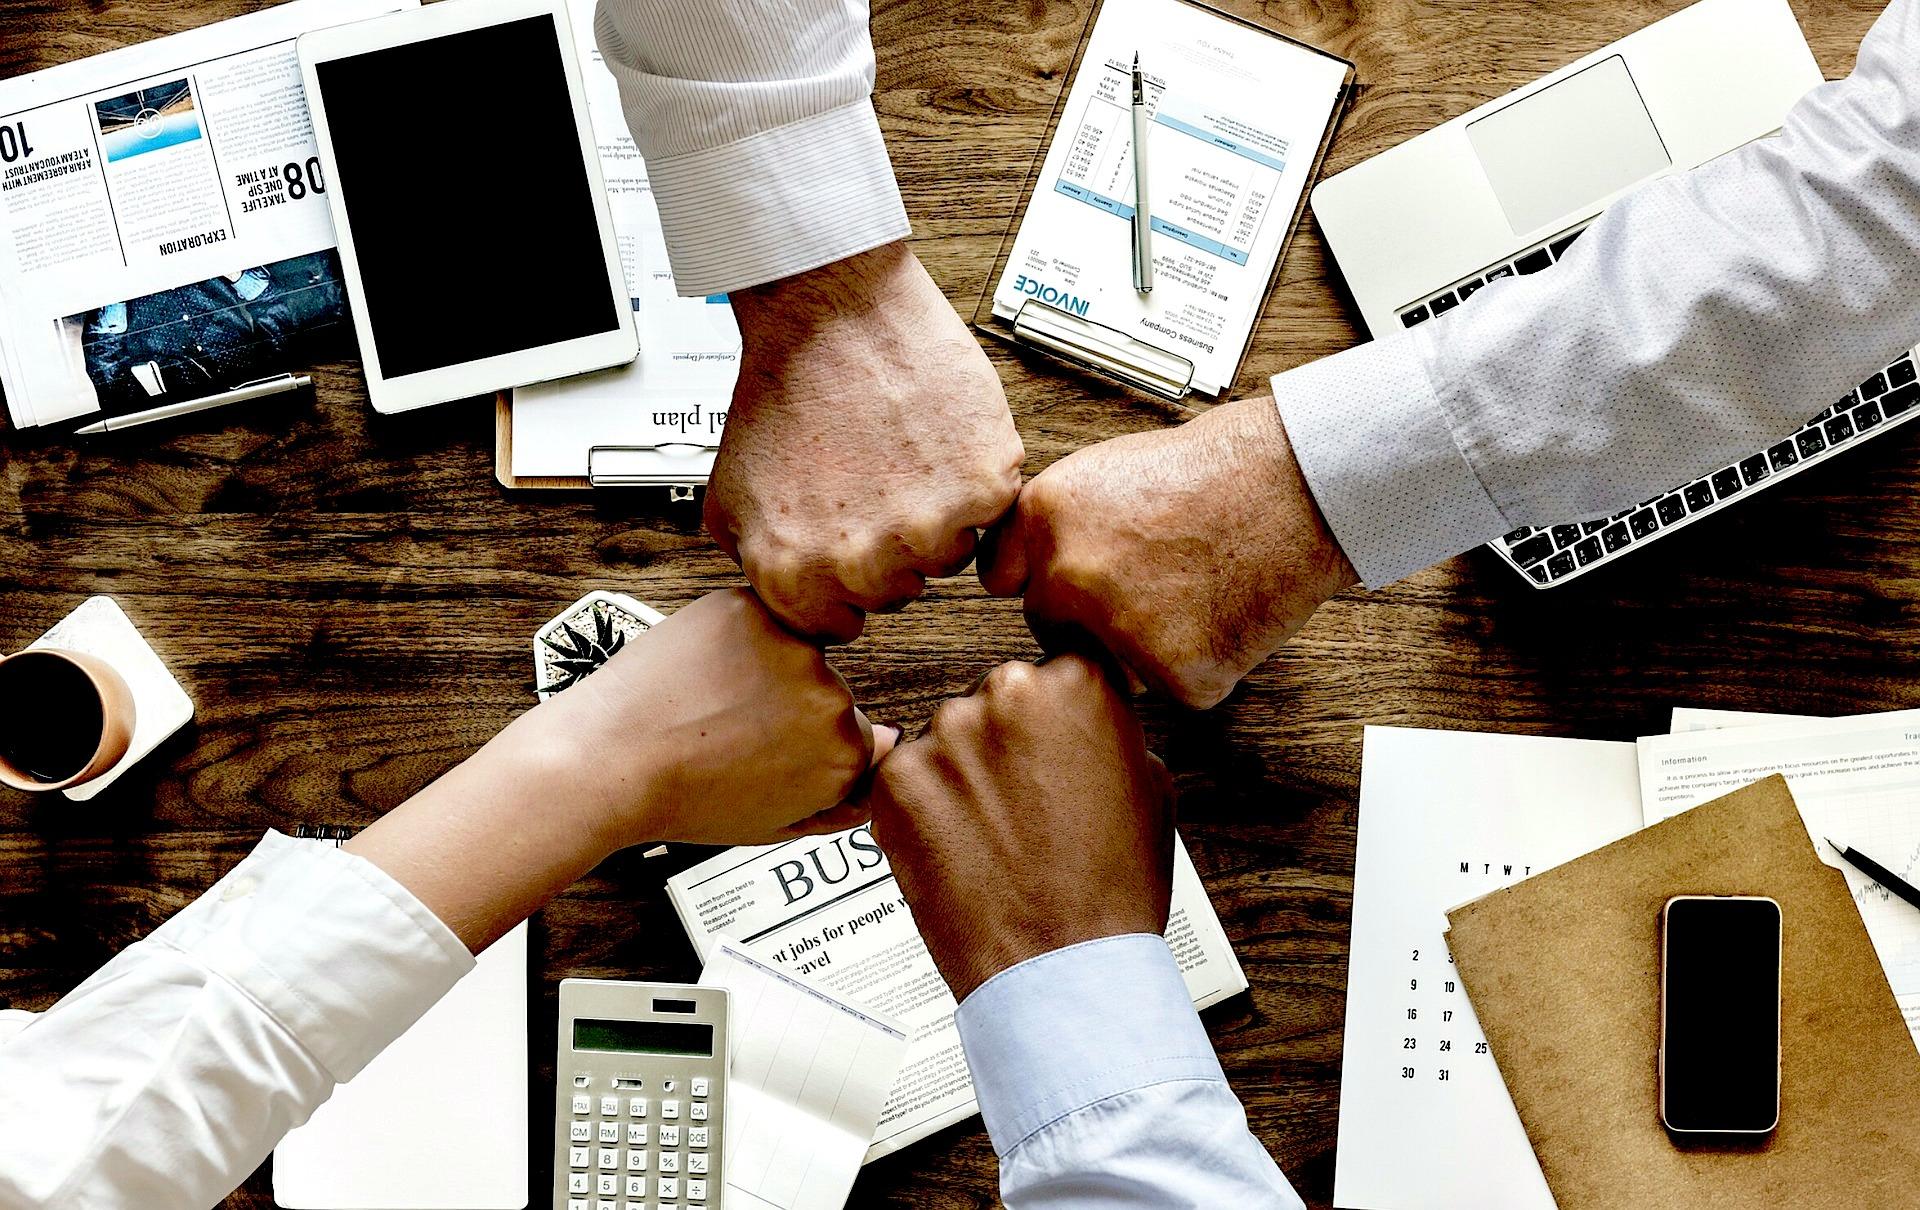 Enterprise 4.0 startups must offer solutions, not just technology